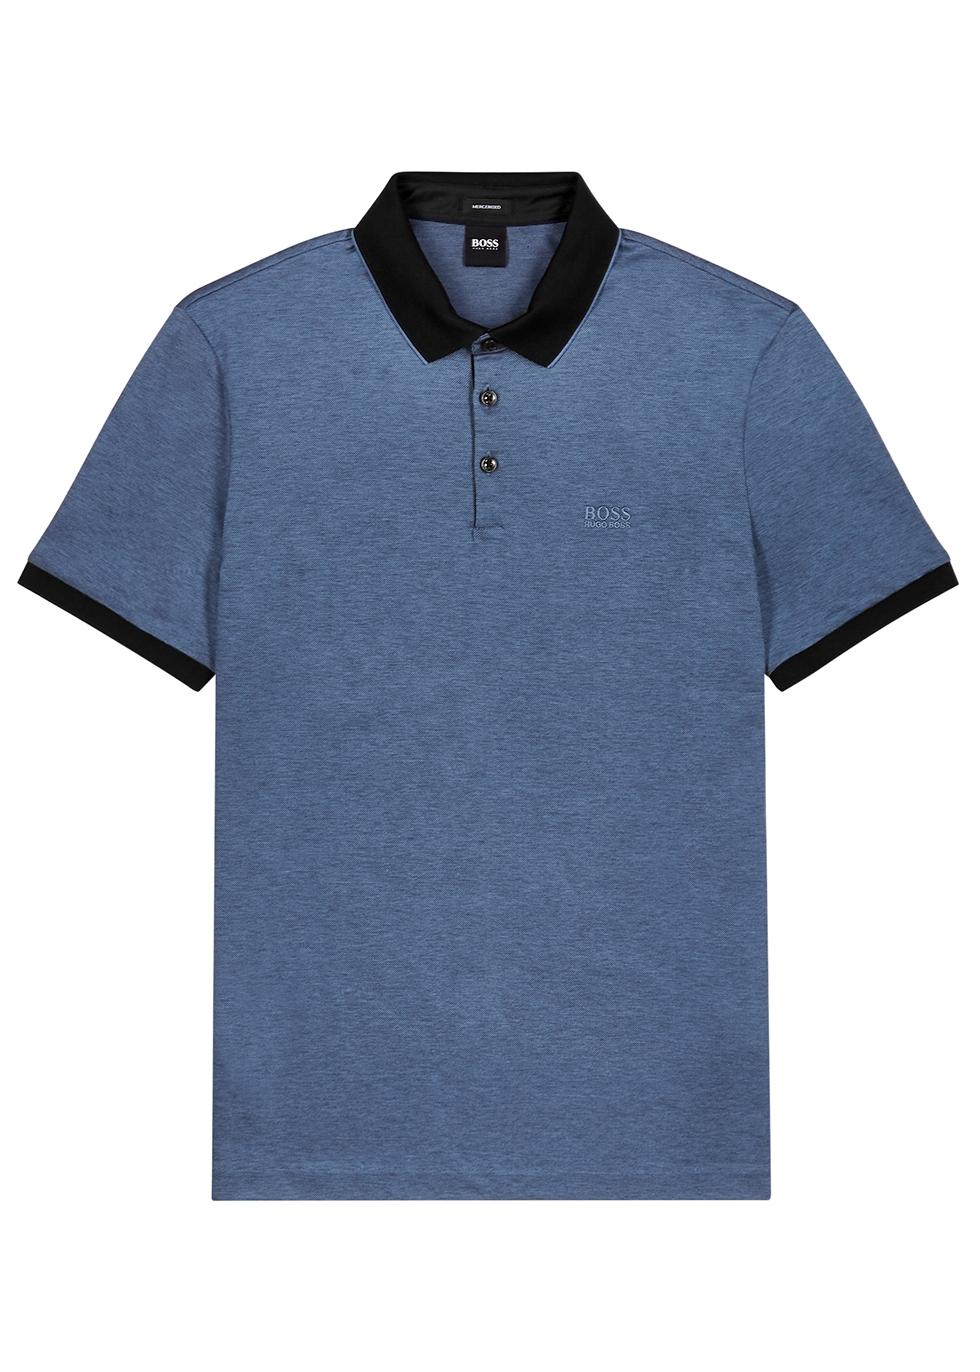 Prout blue cotton polo shirt